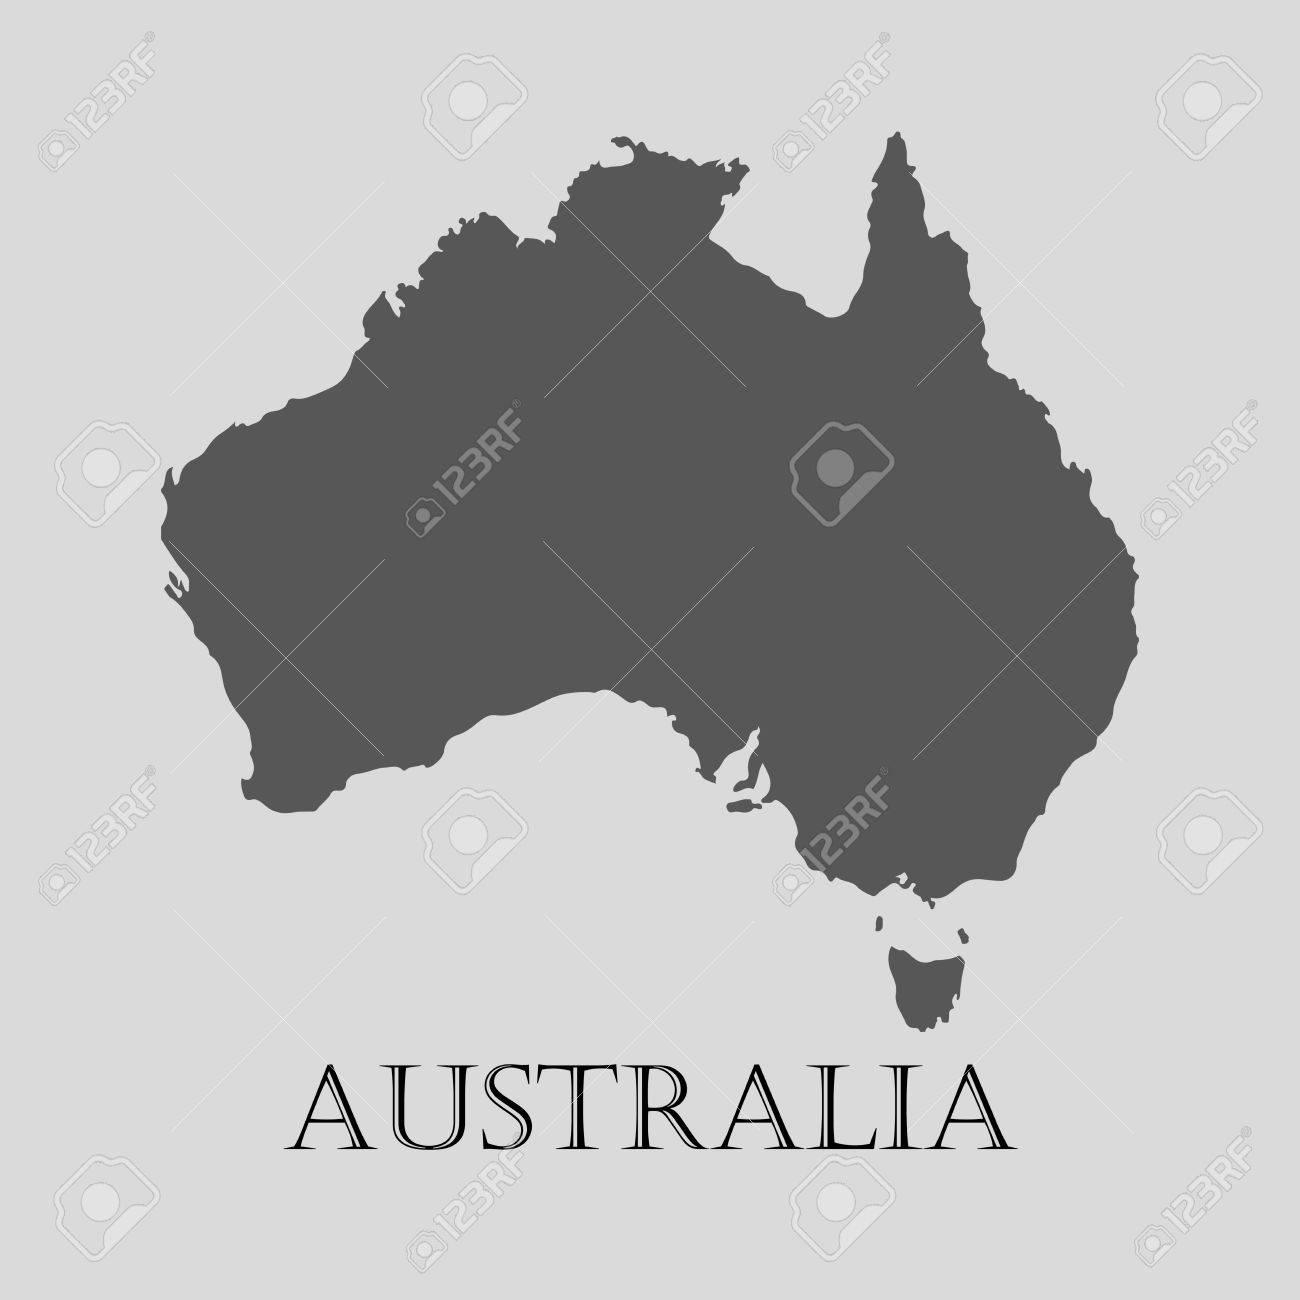 Australia Map Grey.Black Australia Map On Light Grey Background Black Australia